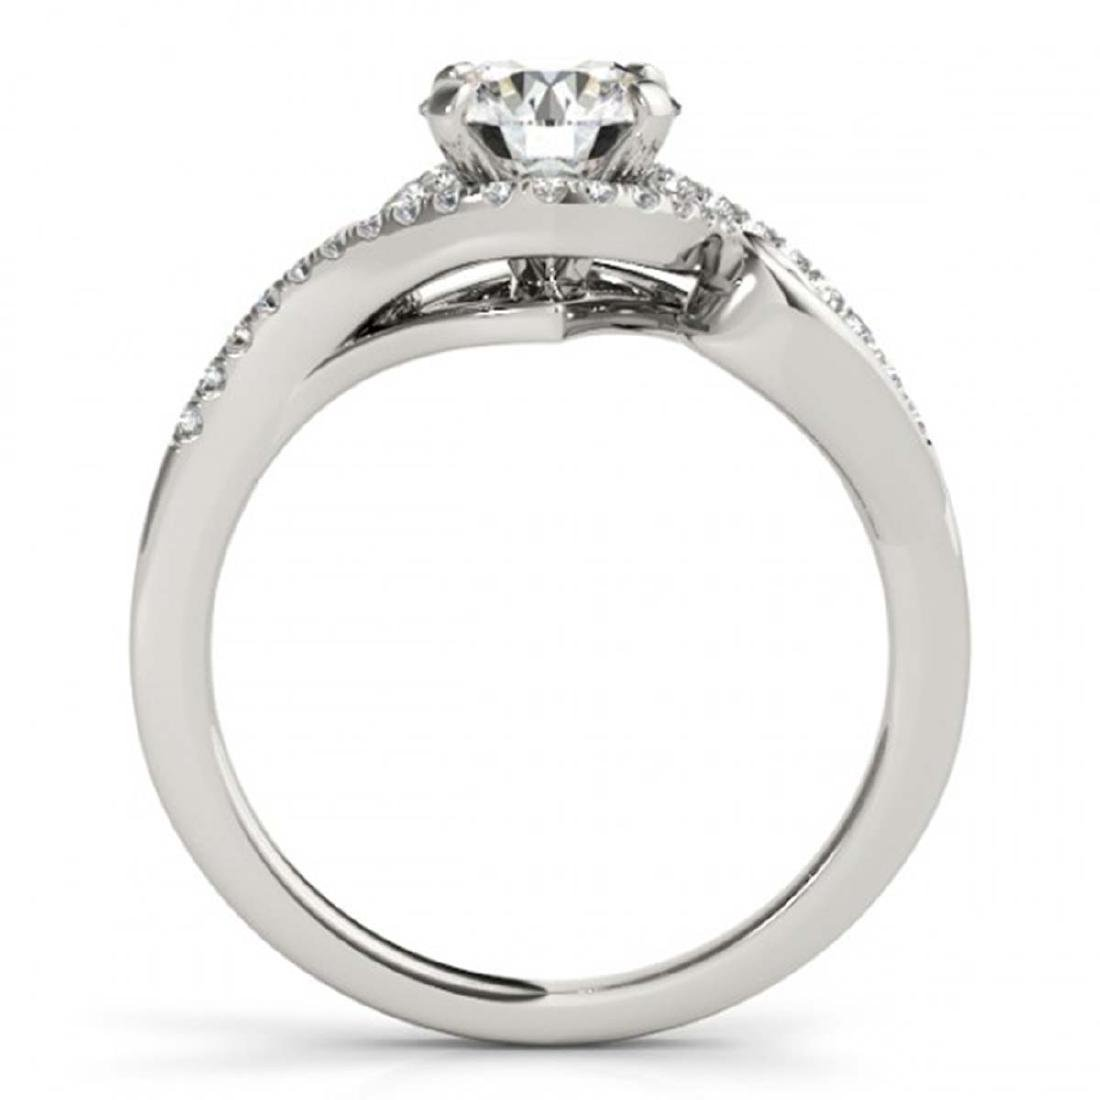 1.25 ctw VS/SI Diamond Solitaire Halo Ring 14K White - 2